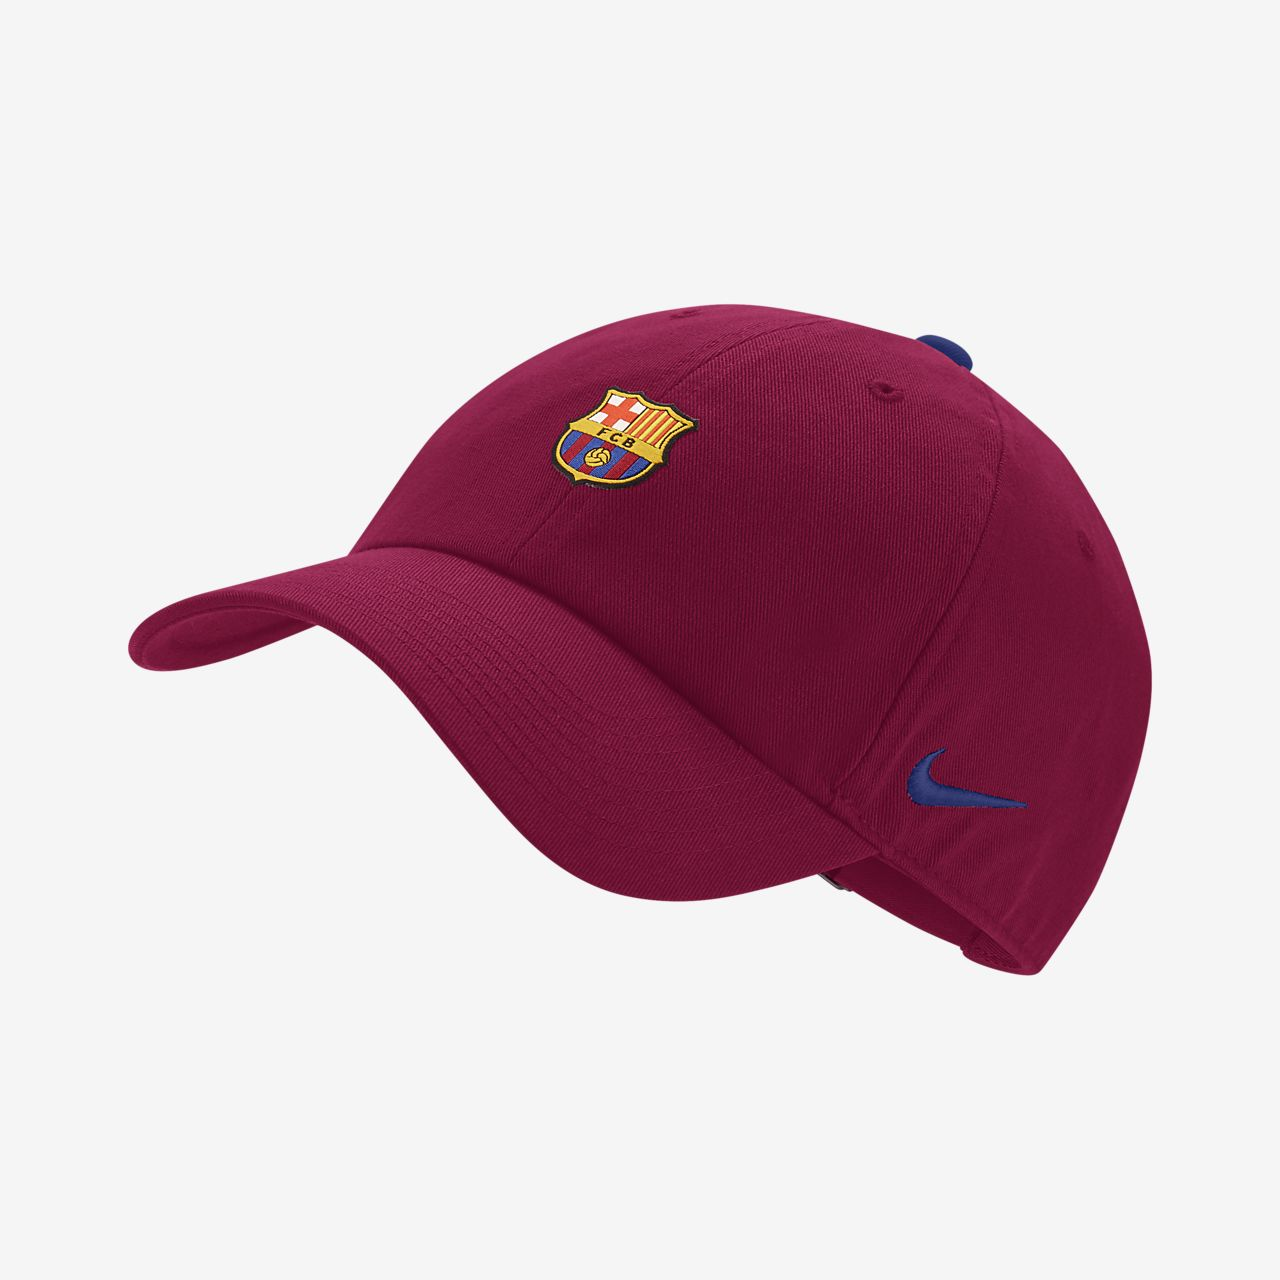 9b9539d0c9f FC Barcelona Heritage 86 Adjustable Hat. Nike.com ZA